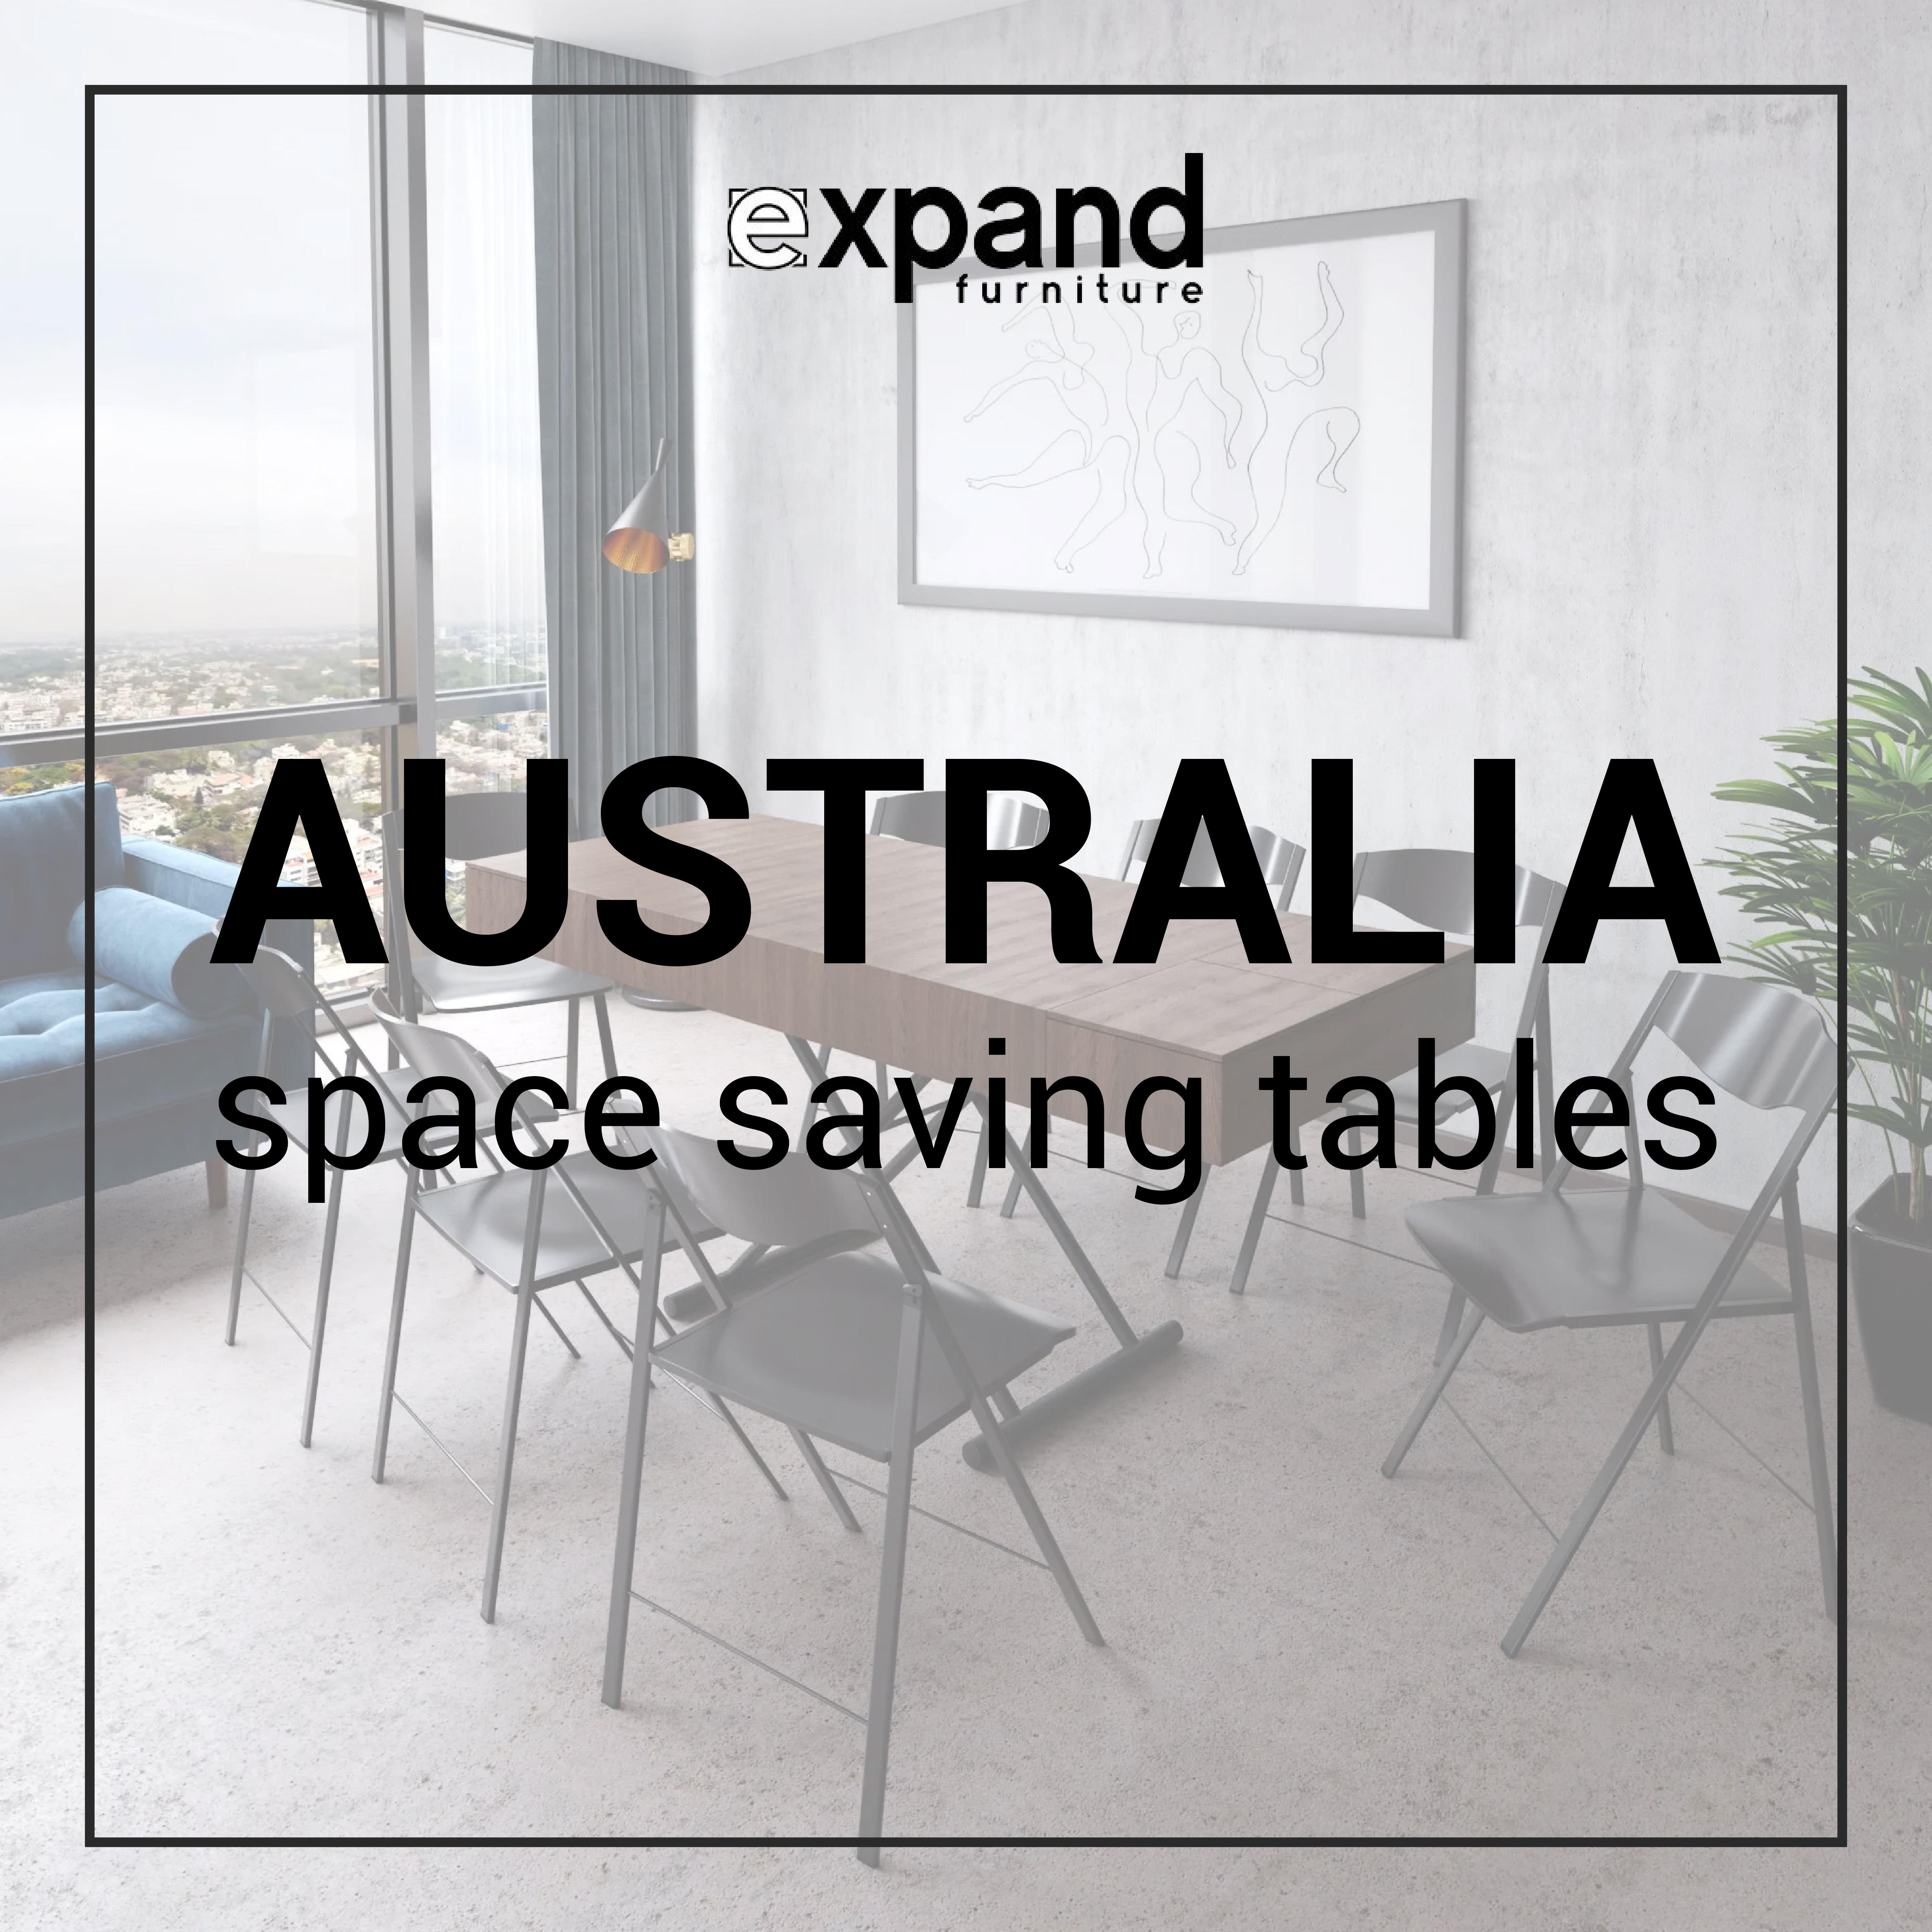 Australia Space Saving Tables